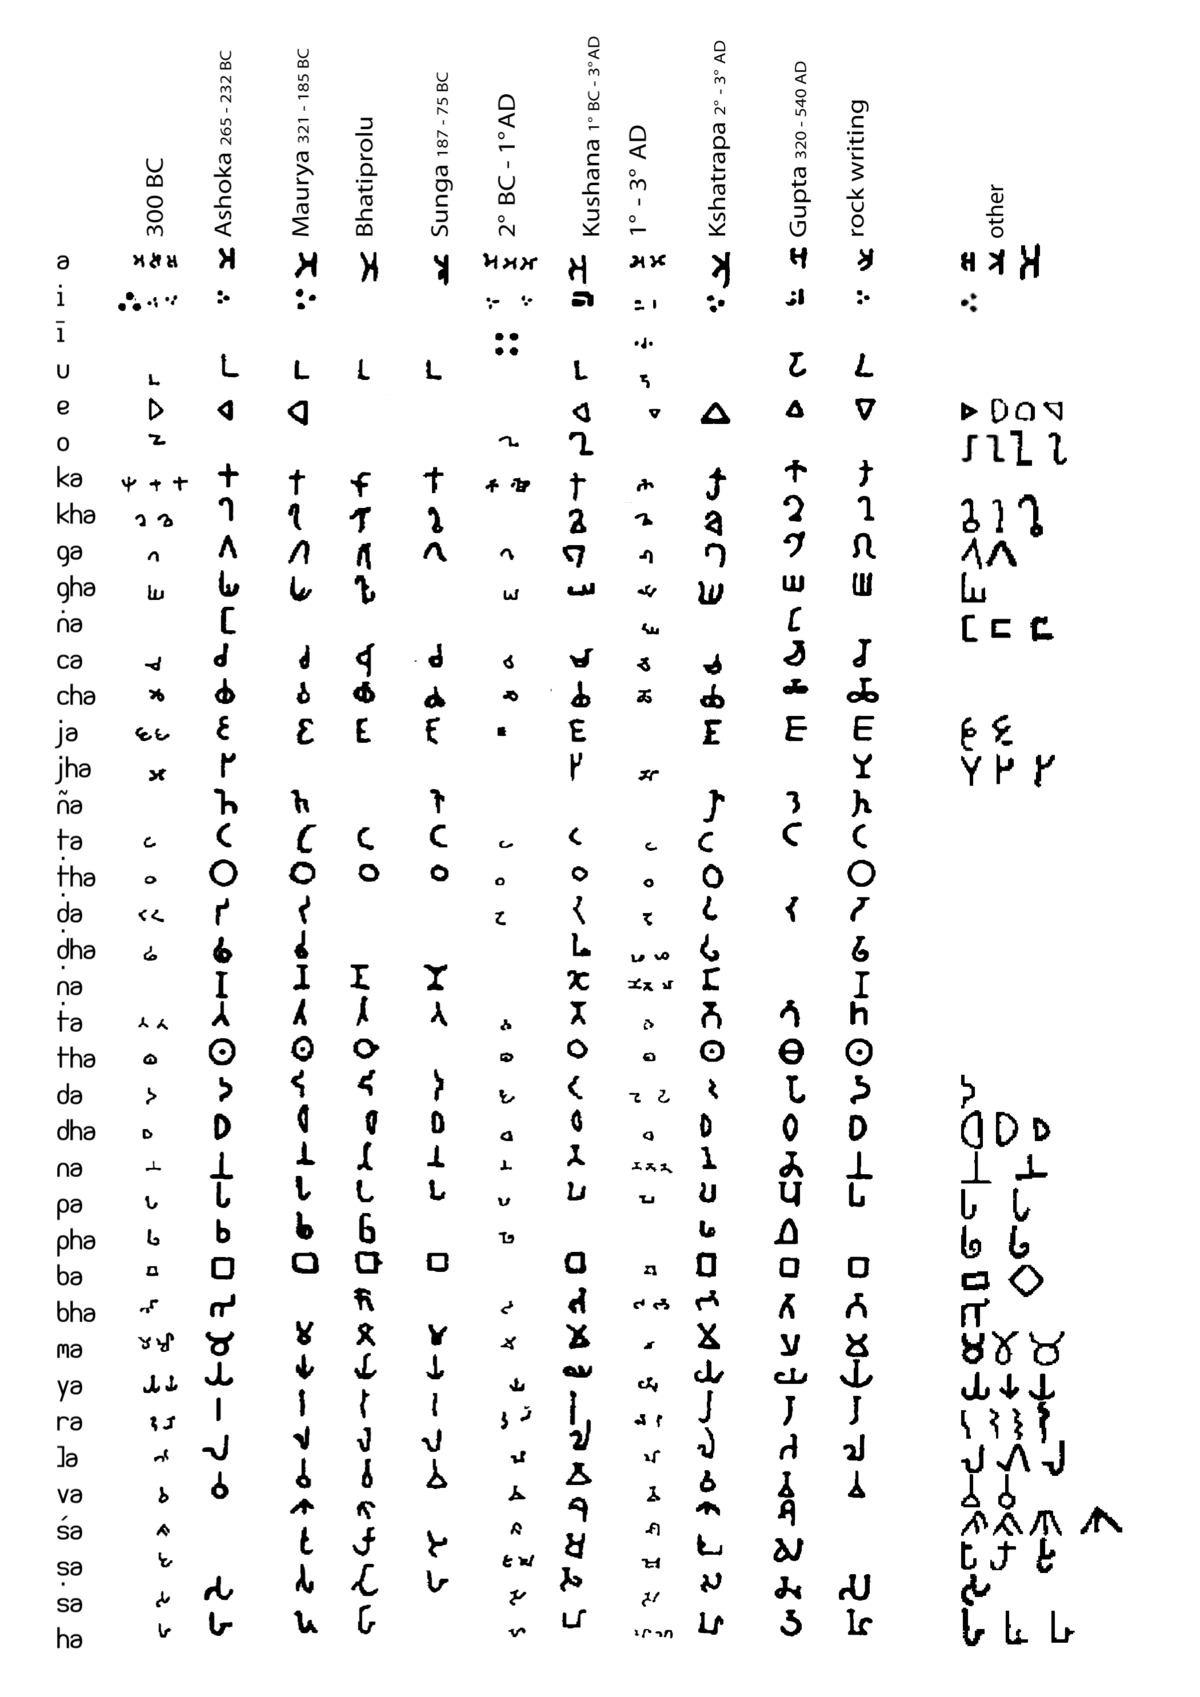 tamil alphabet in sinhala pdf